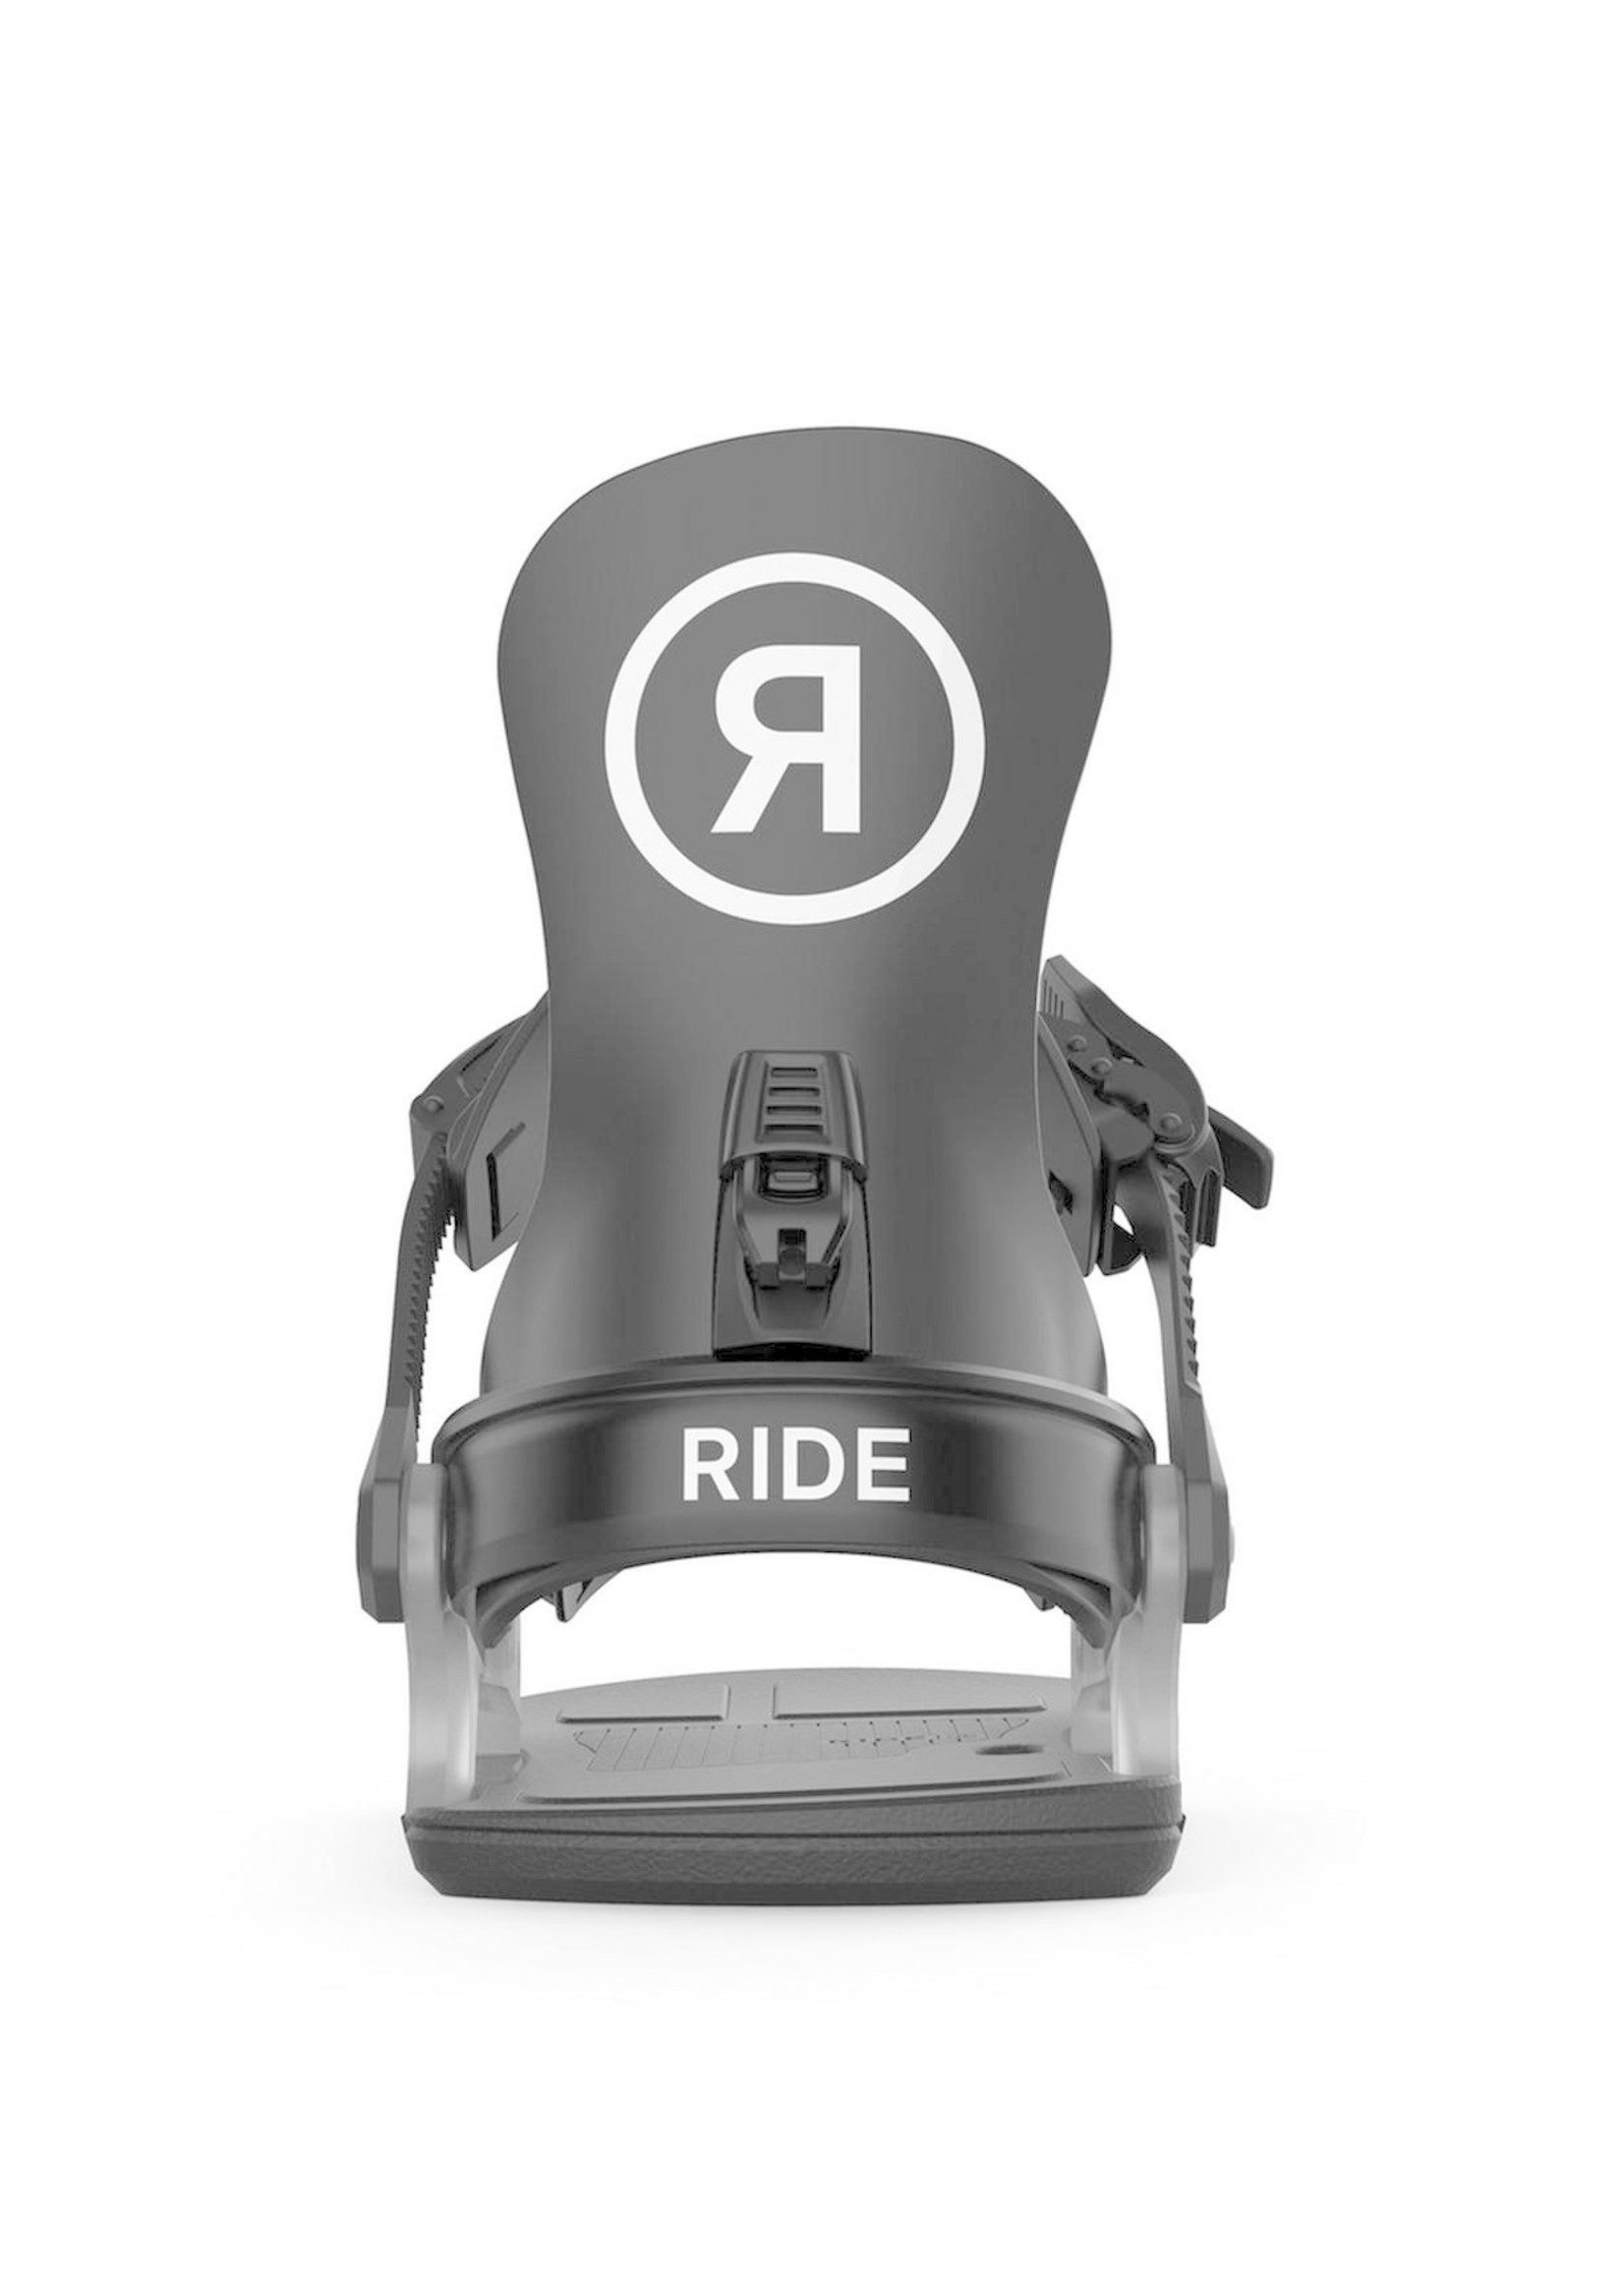 Ride CL-4